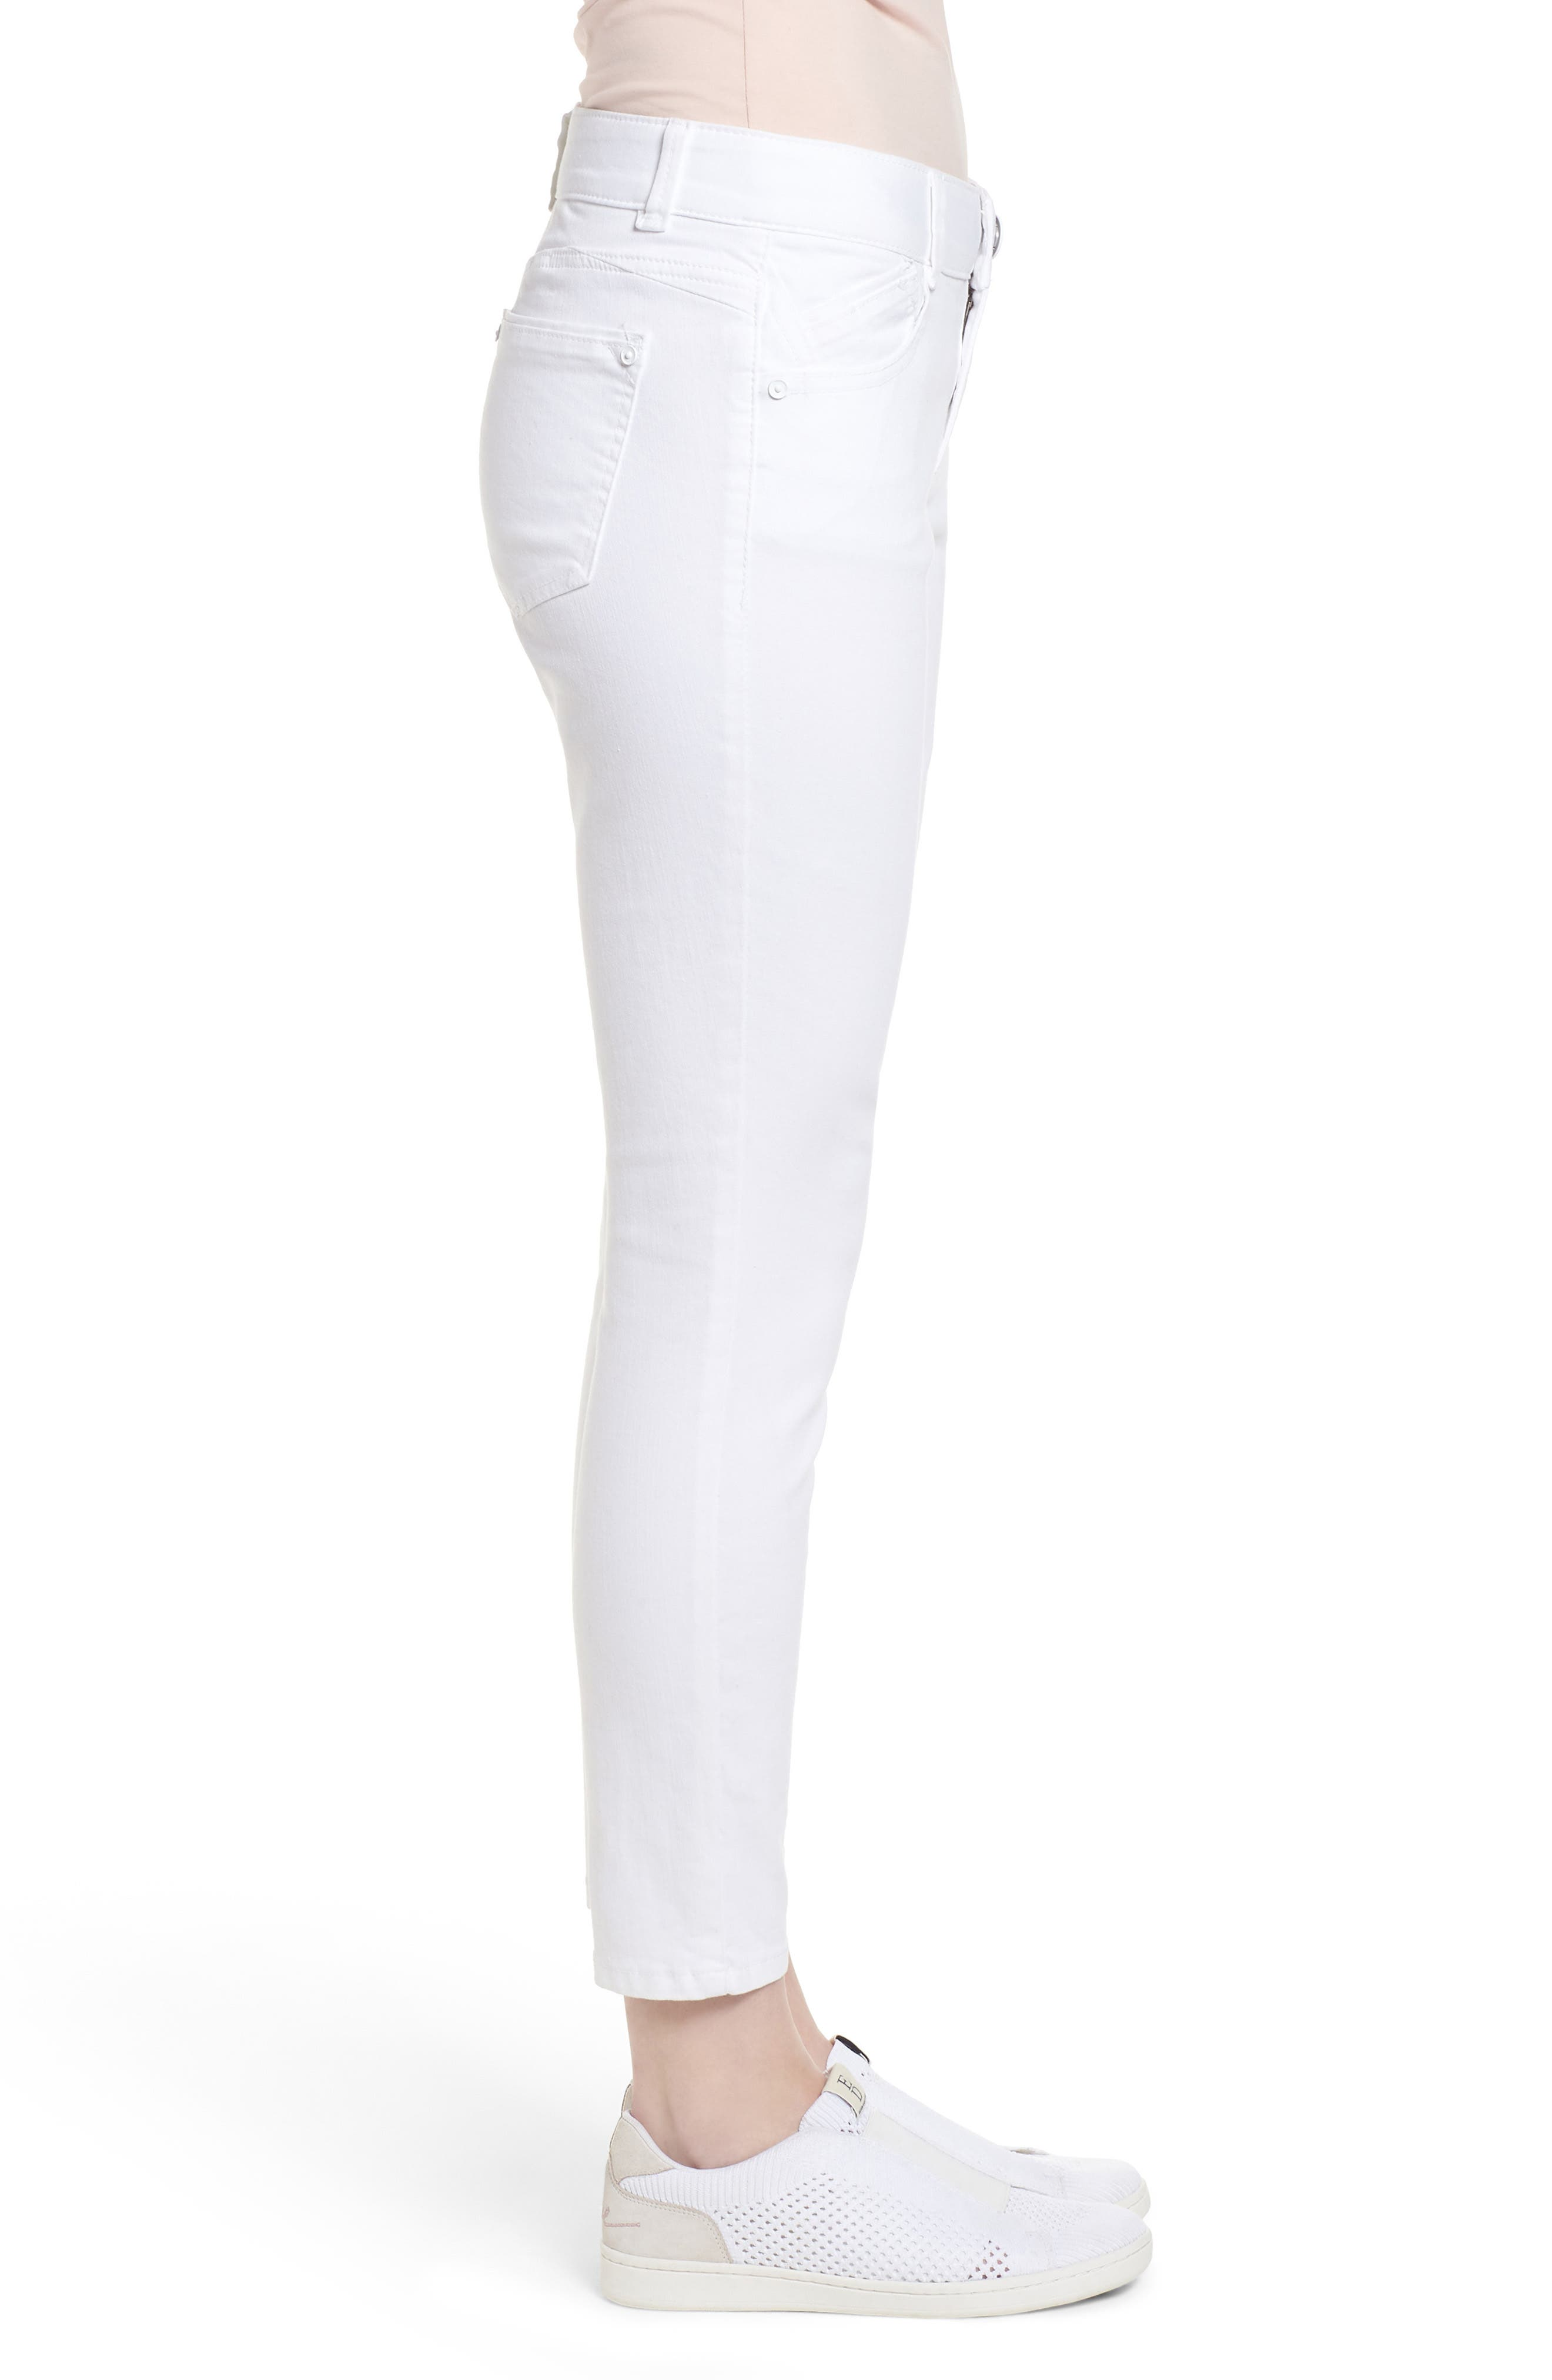 Ab-solution Ankle Skimmer Jeans,                             Alternate thumbnail 3, color,